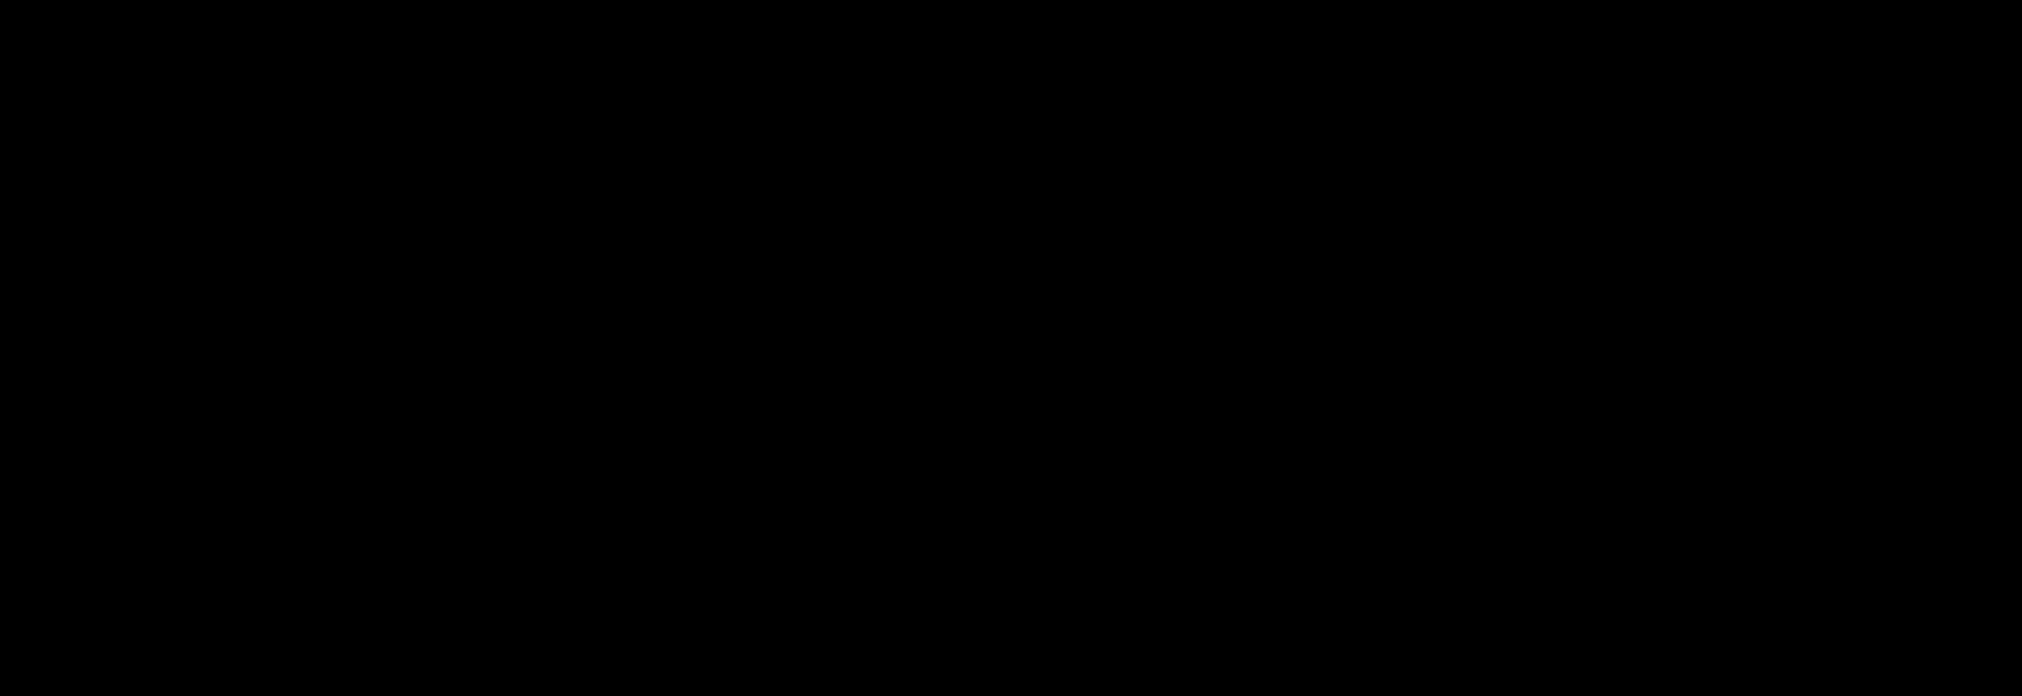 Curcumin pyrazole-d<sub>6</sub>